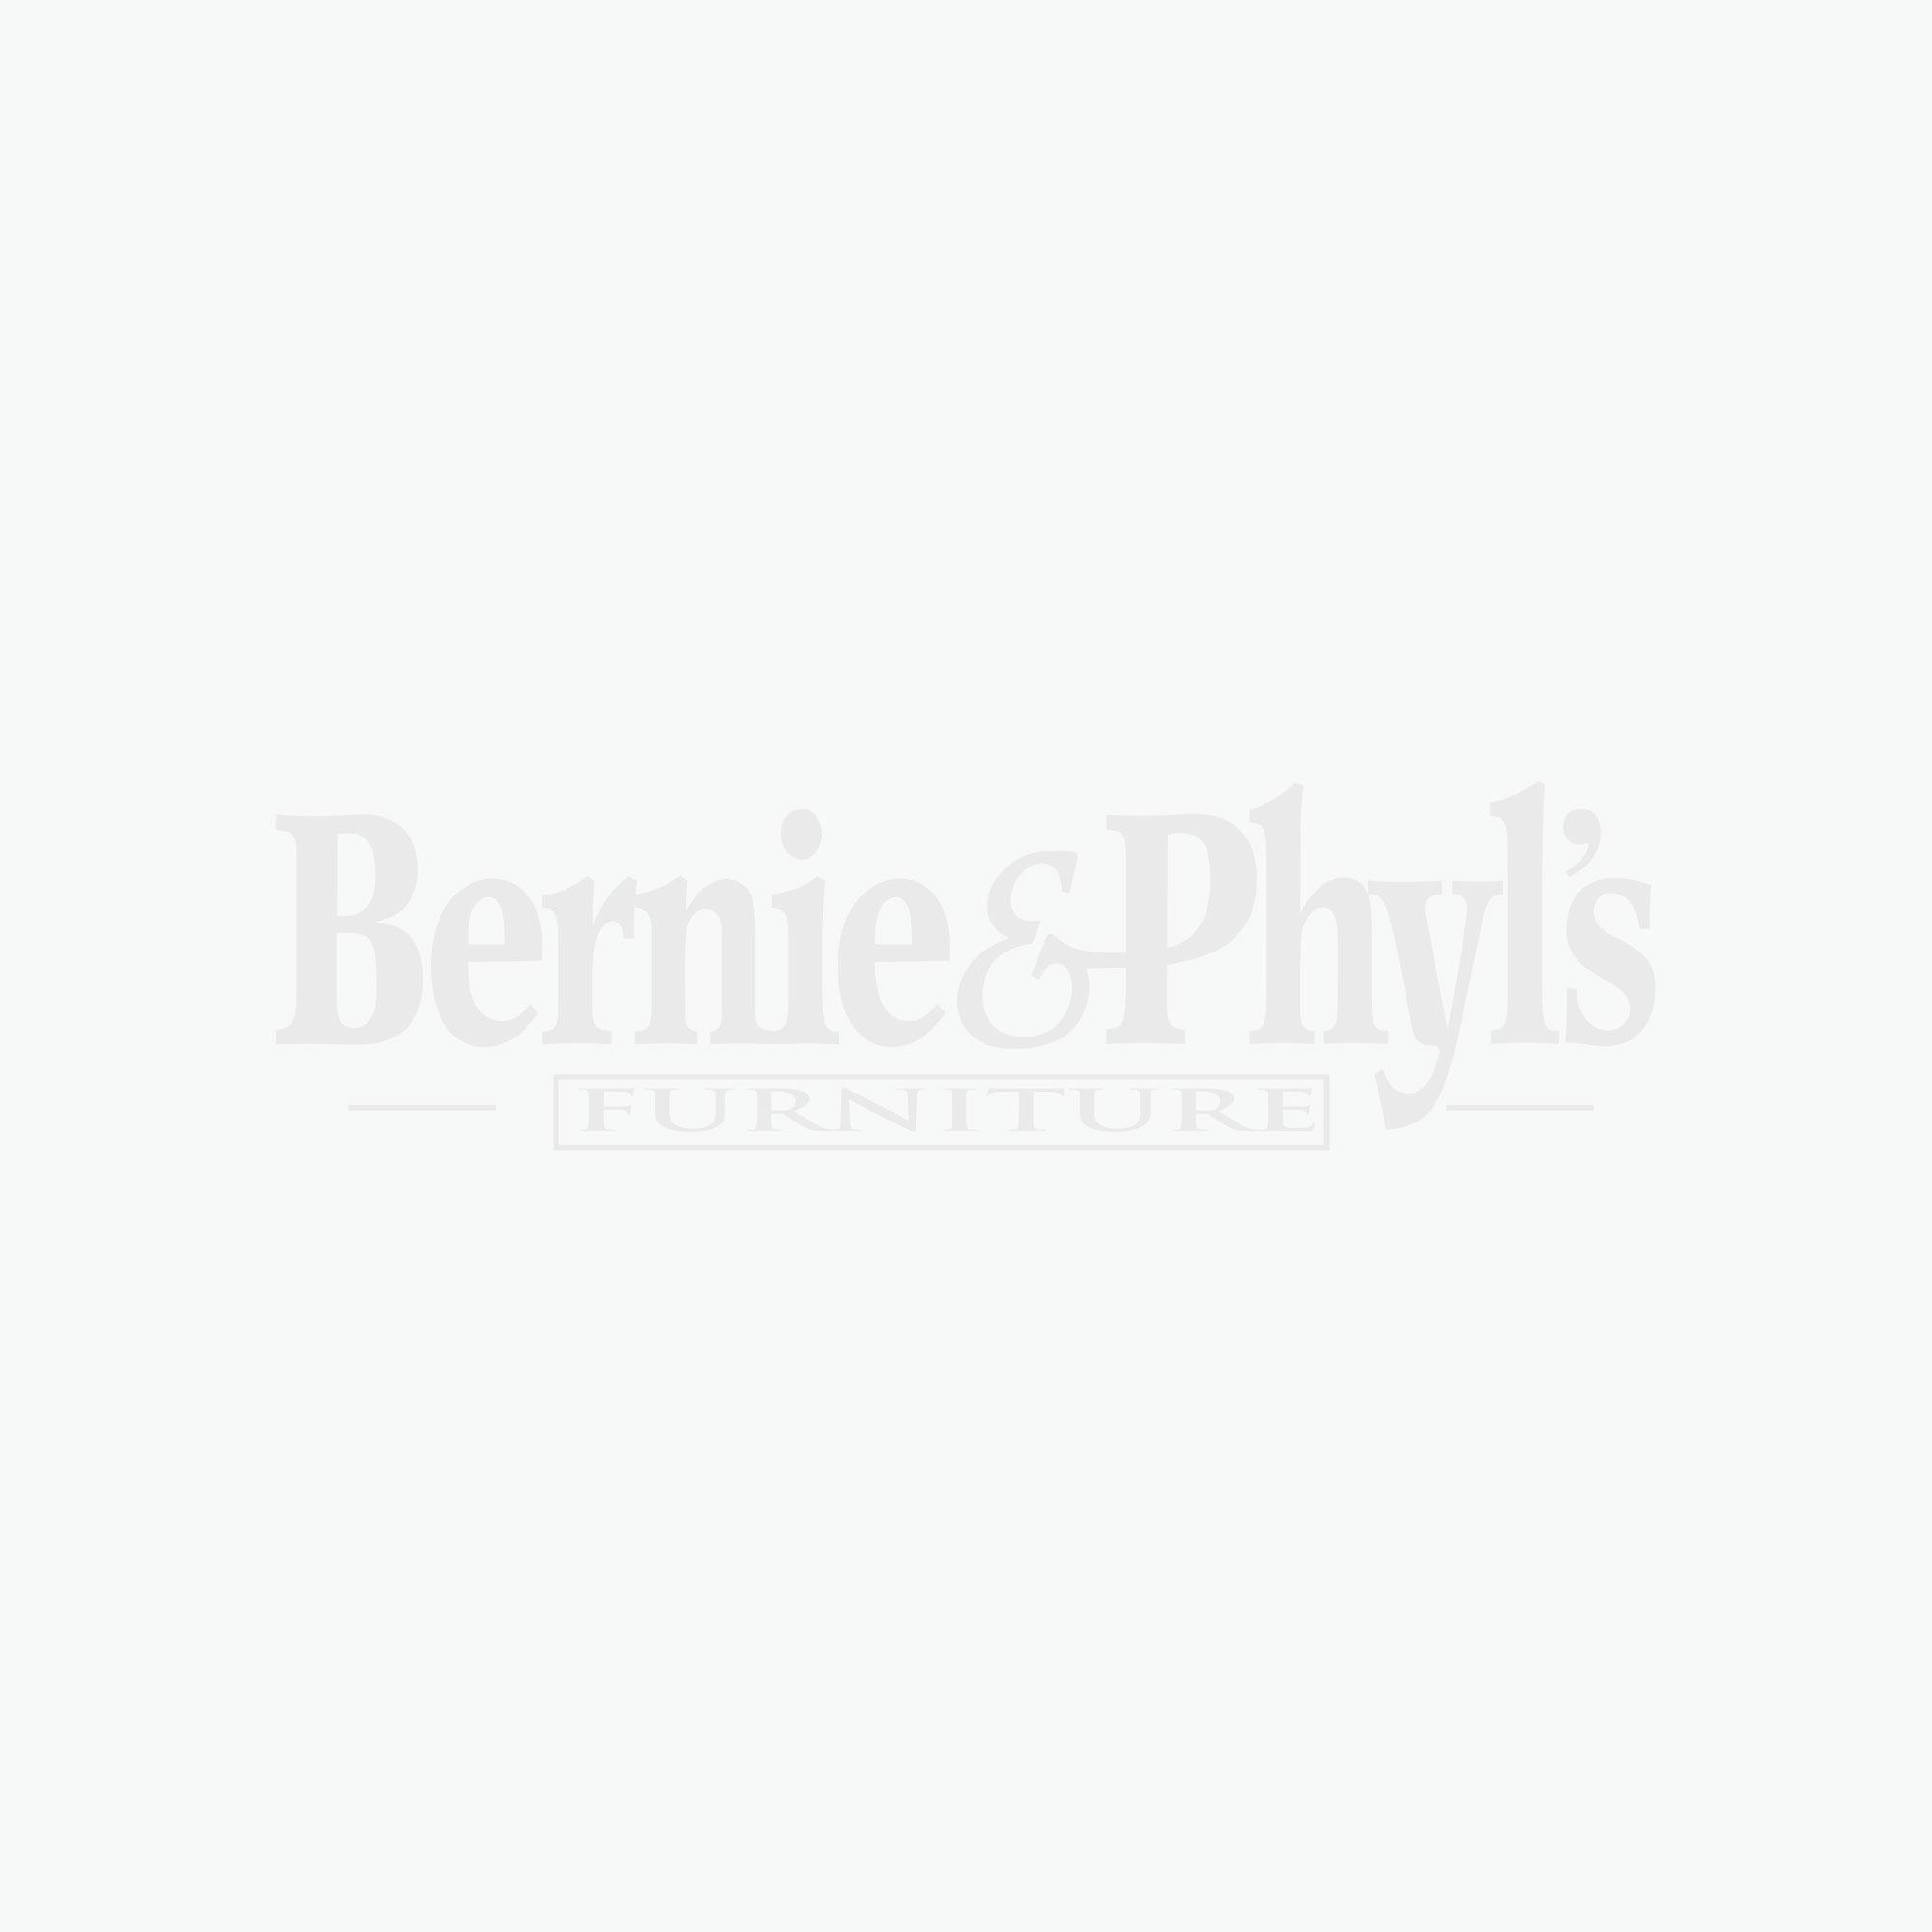 Larimer Rectangular End Table - Dark Brown - (Set of 1) - T654-2 by Ashley Furniture Signature Design